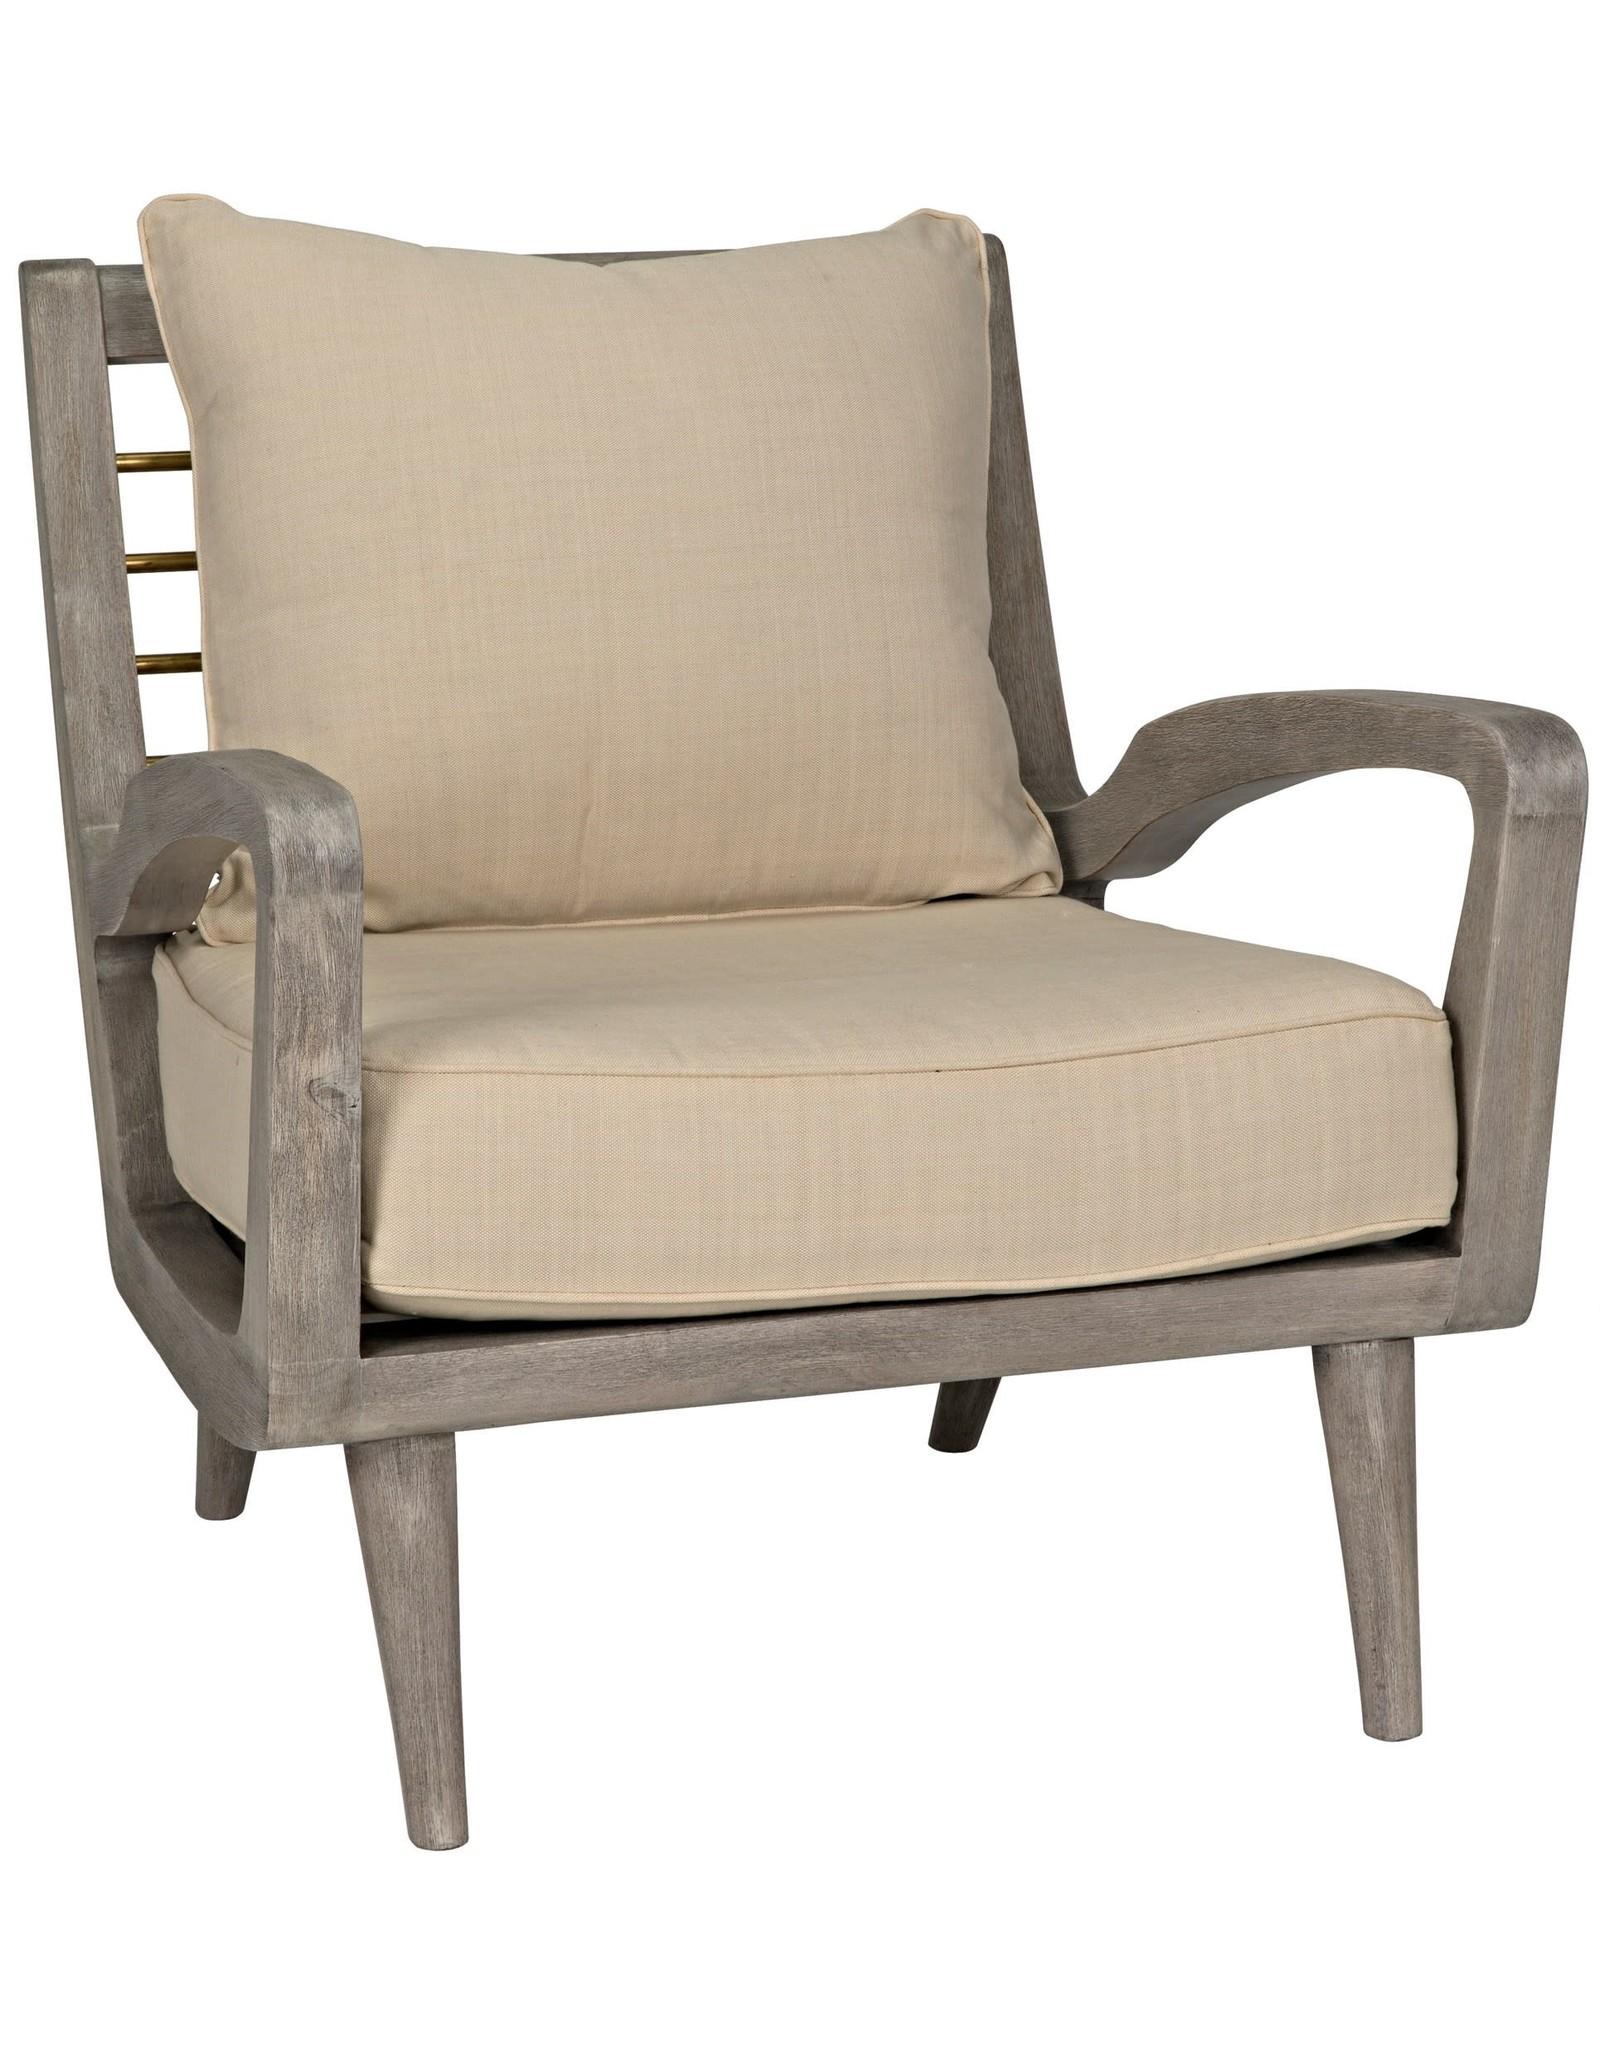 Website Noir Pearson Chair w/Brass Bars - Distressed Gray